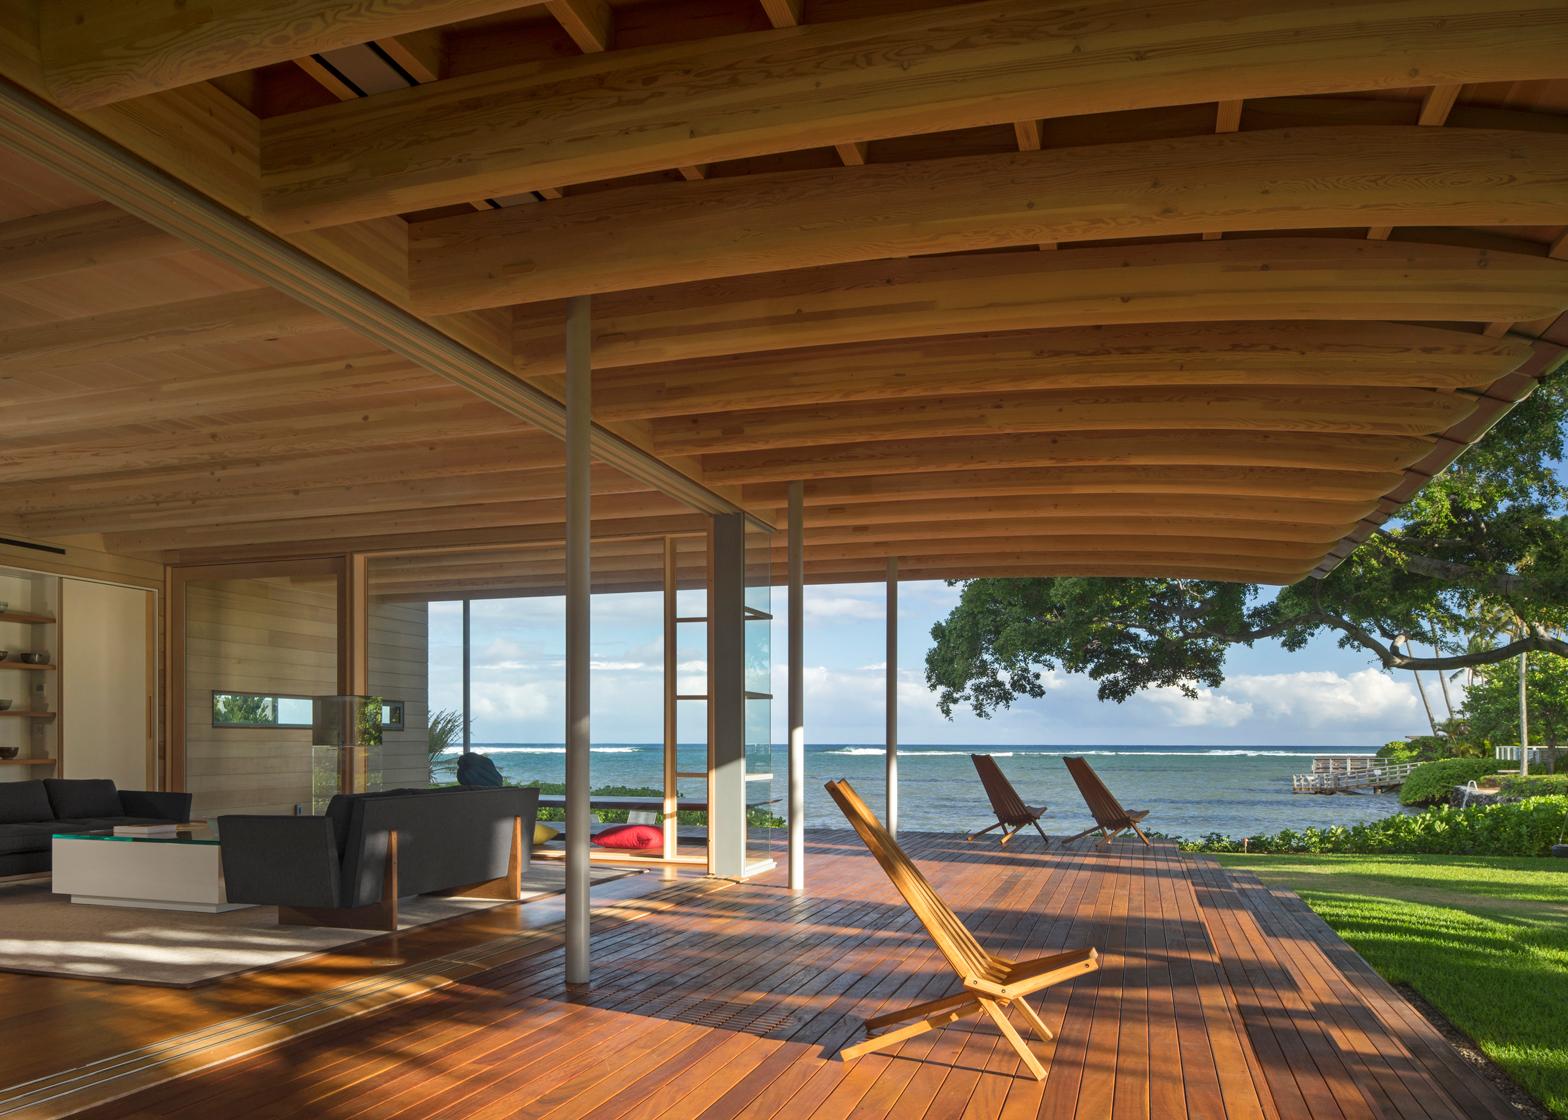 Island Residence; Honolulu, Hawaii by Bohlin Cywinski Jackson. Photography by Nic Lehoux